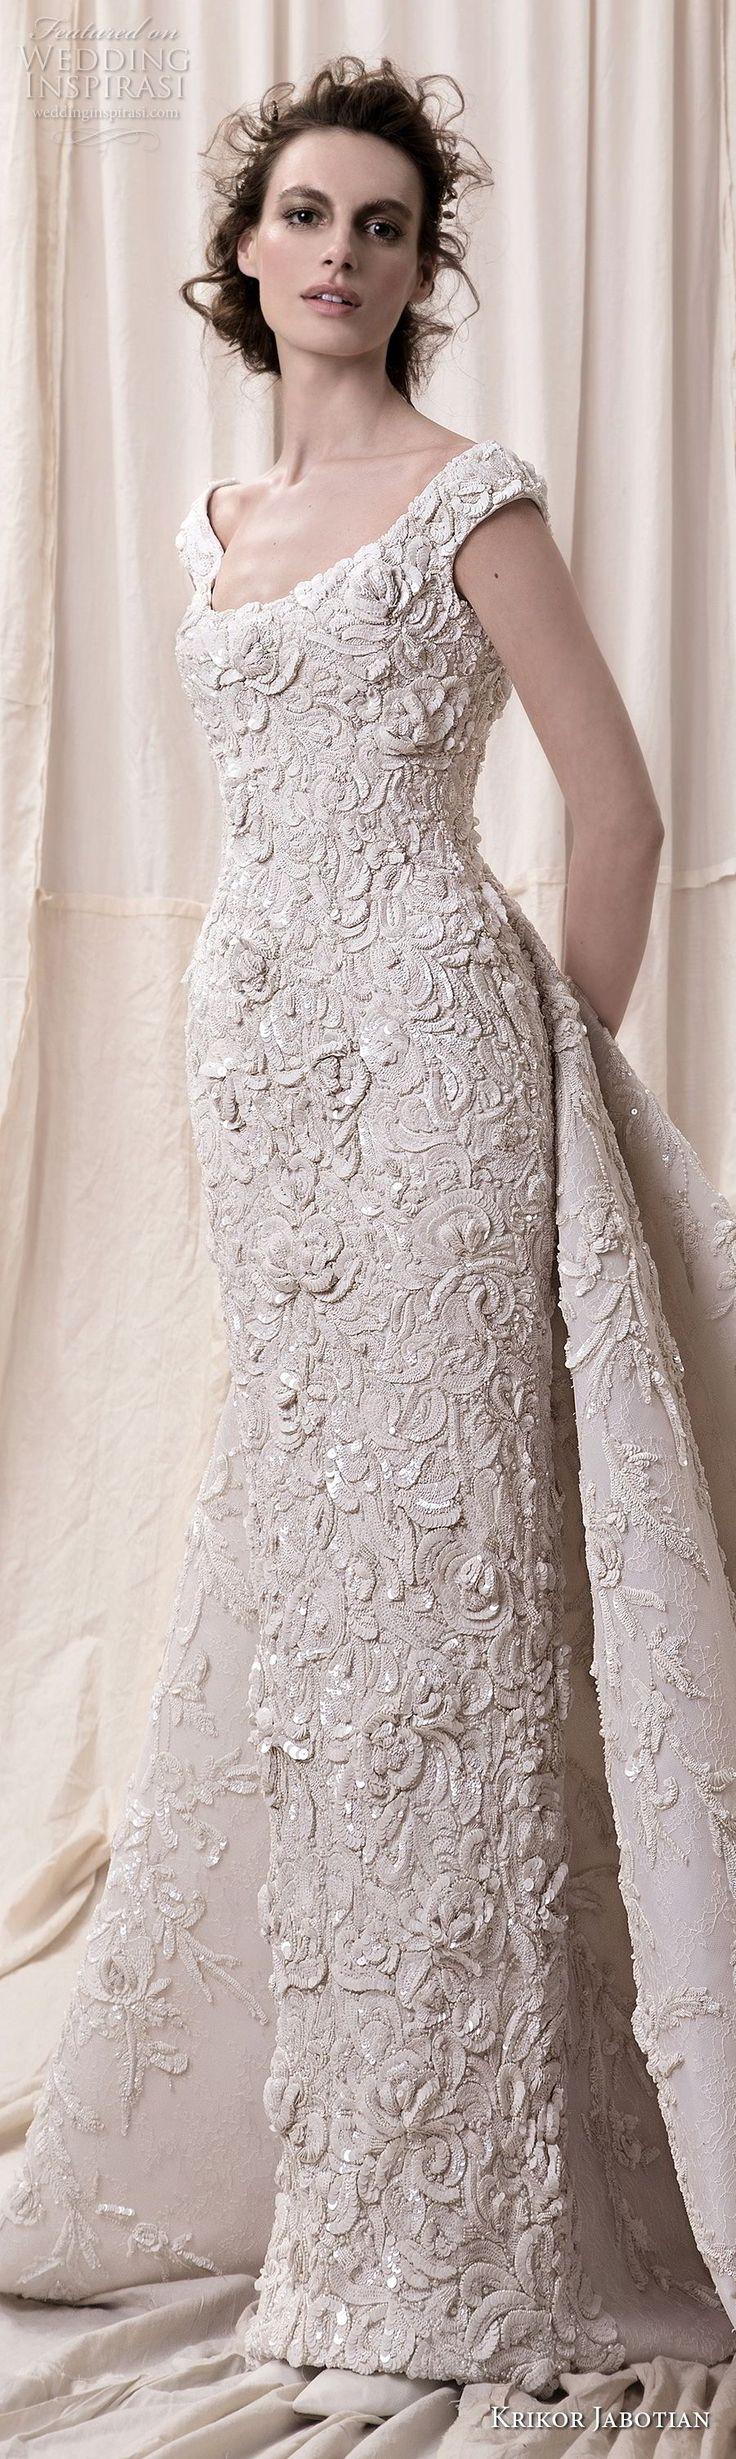 Best Sheath Wedding Dresses Ideas On Pinterest Long Wedding